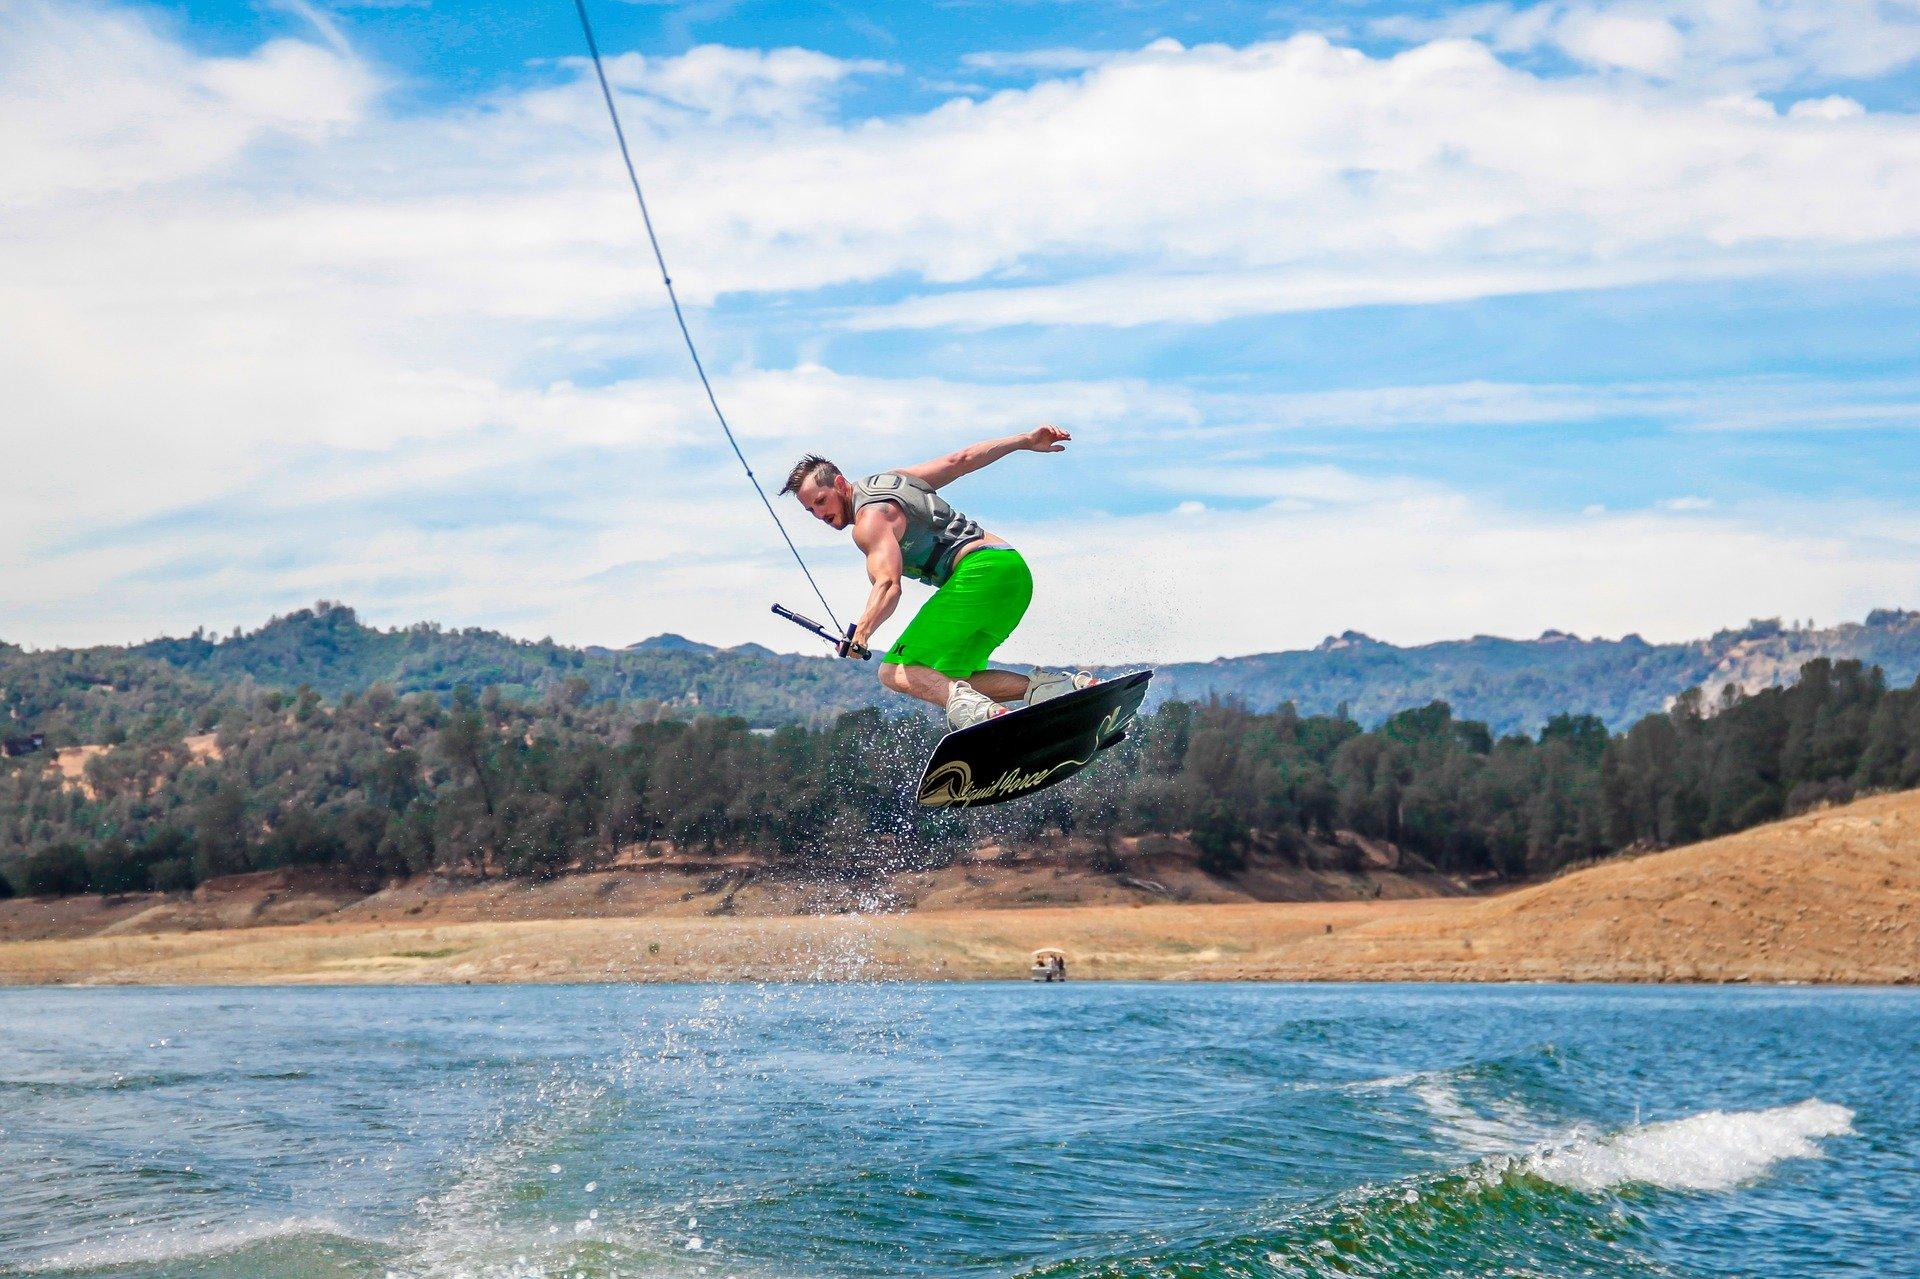 Wakeboarder (photo: chadseiverson)